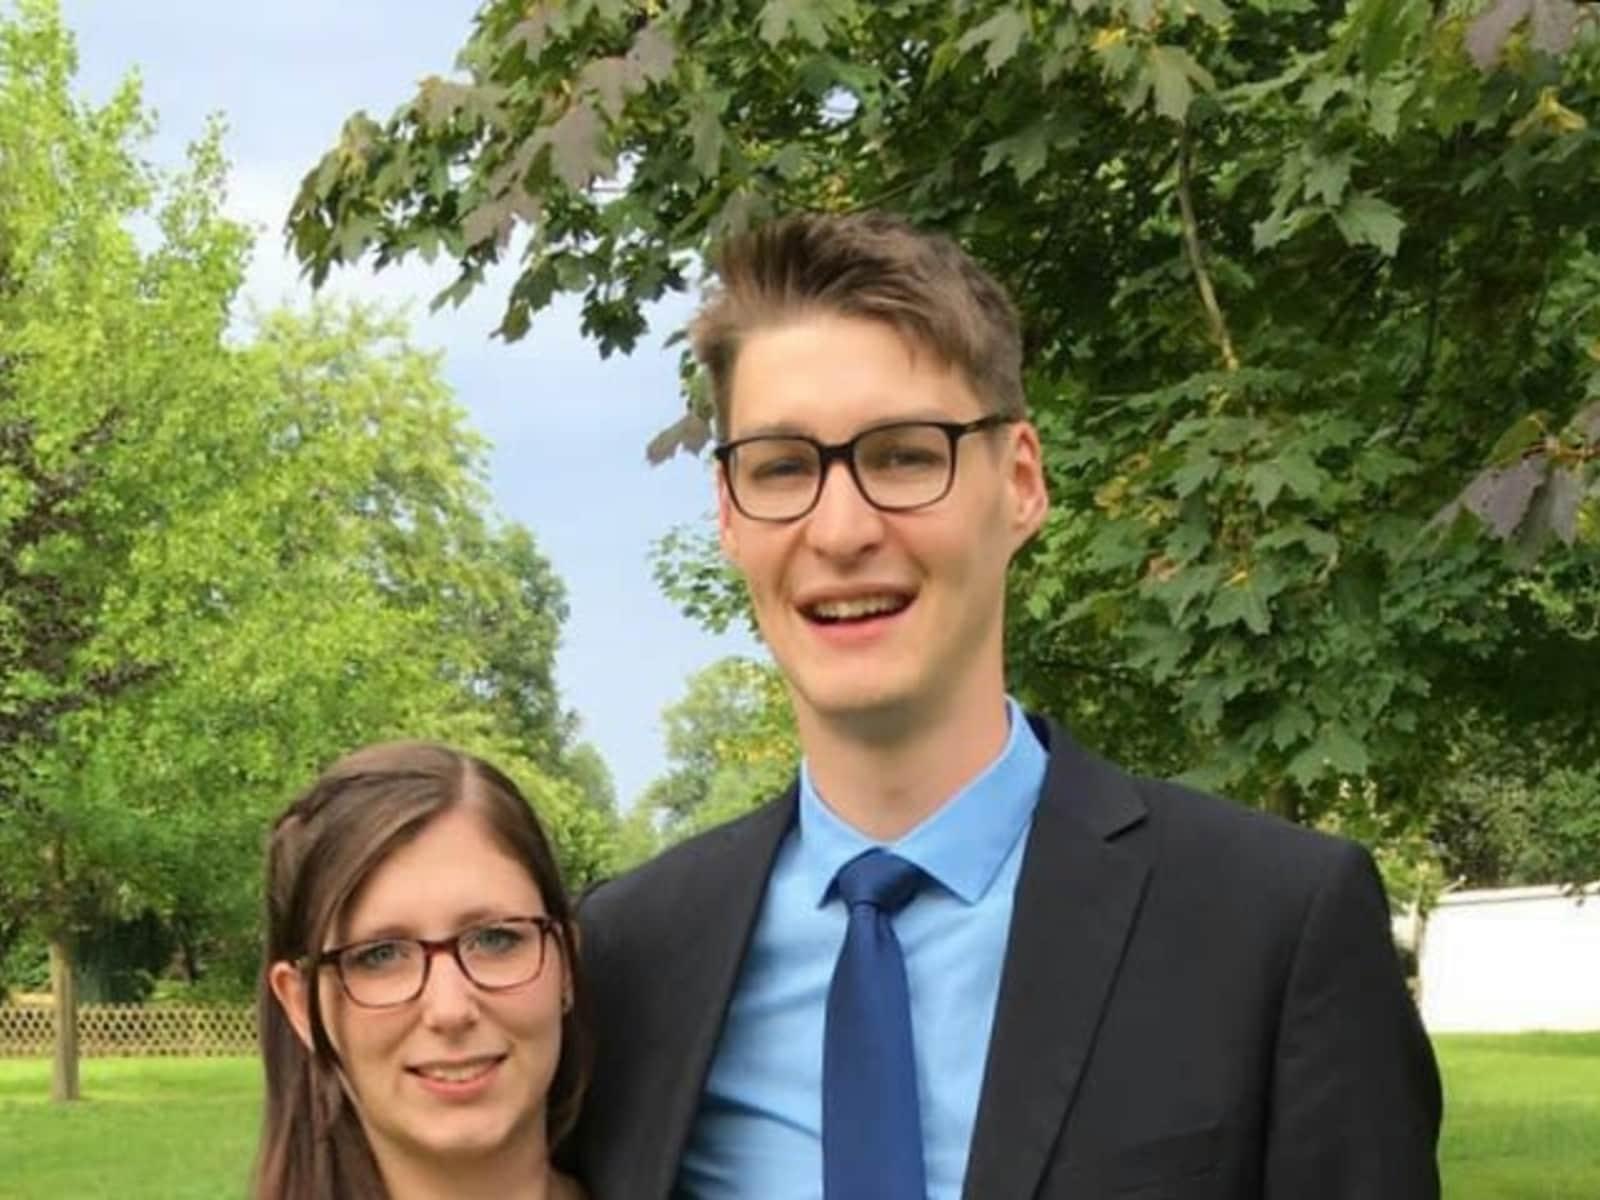 Hans-ulrich & Katharina from Hildesheim, Germany